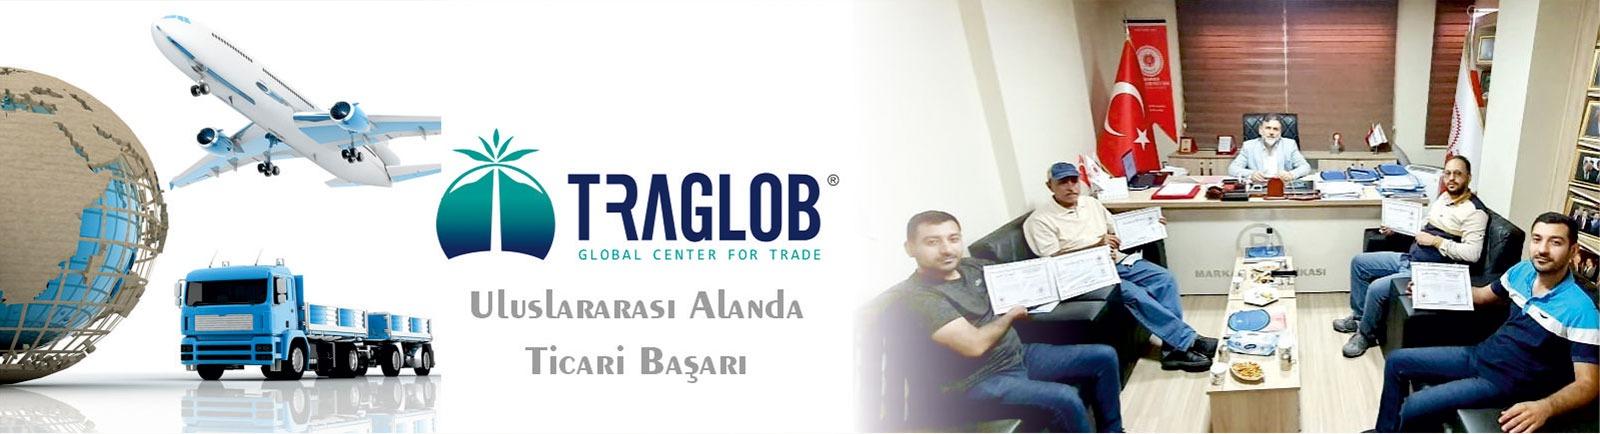 Ticaretin Global Merkezi Traglob